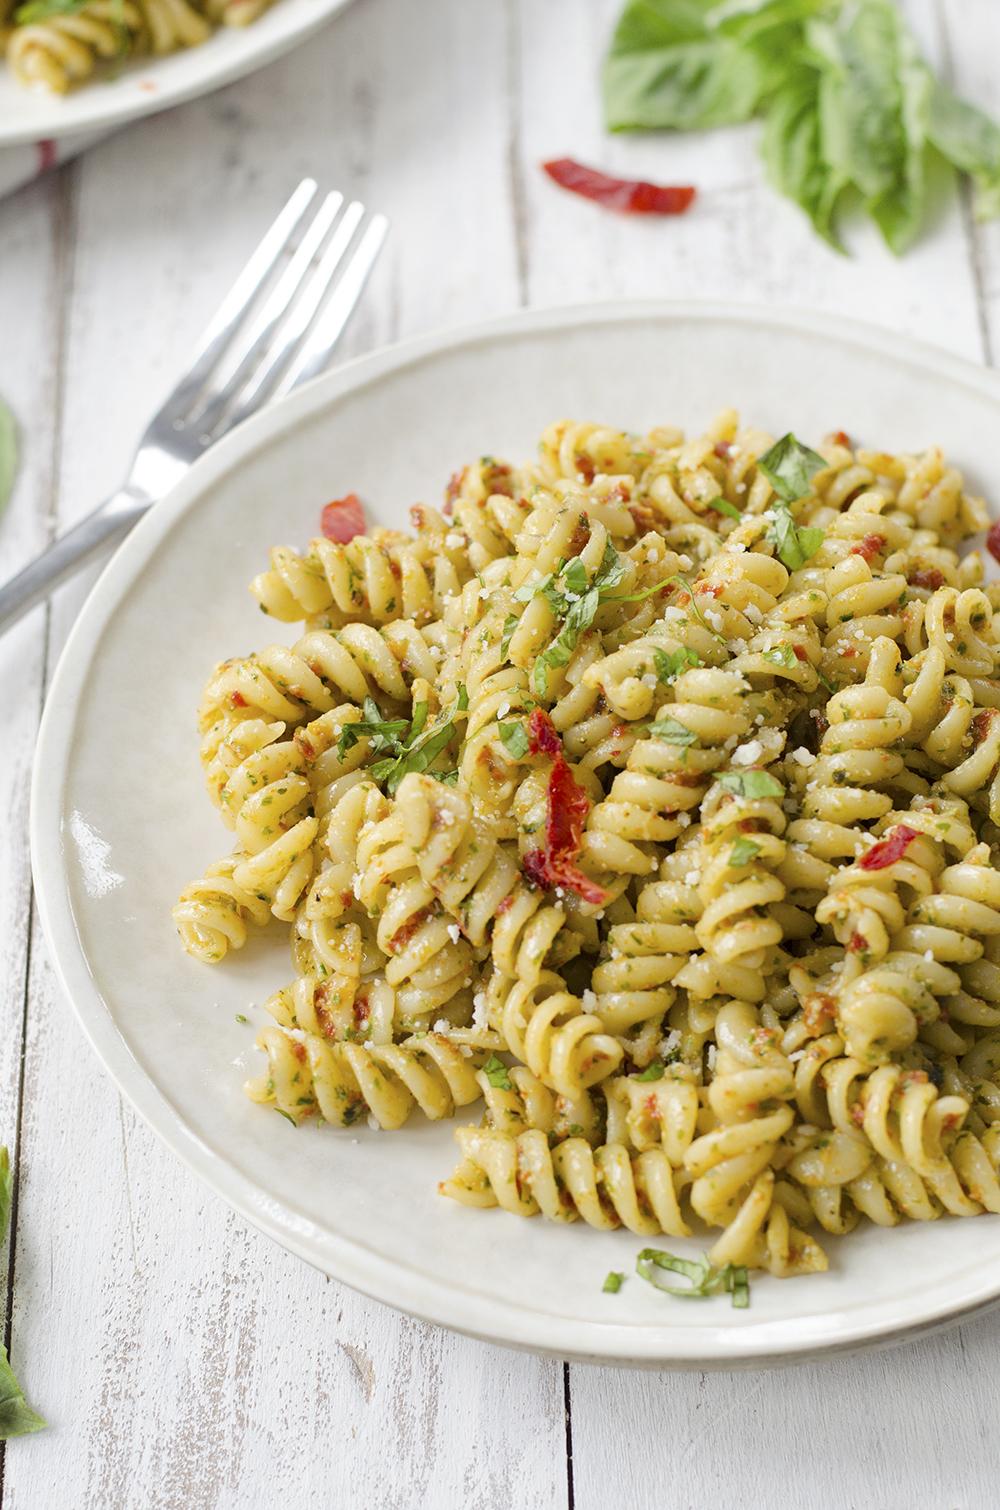 #Recipe : 7 Ingredient Sun Dried Tomato Pesto Pasta